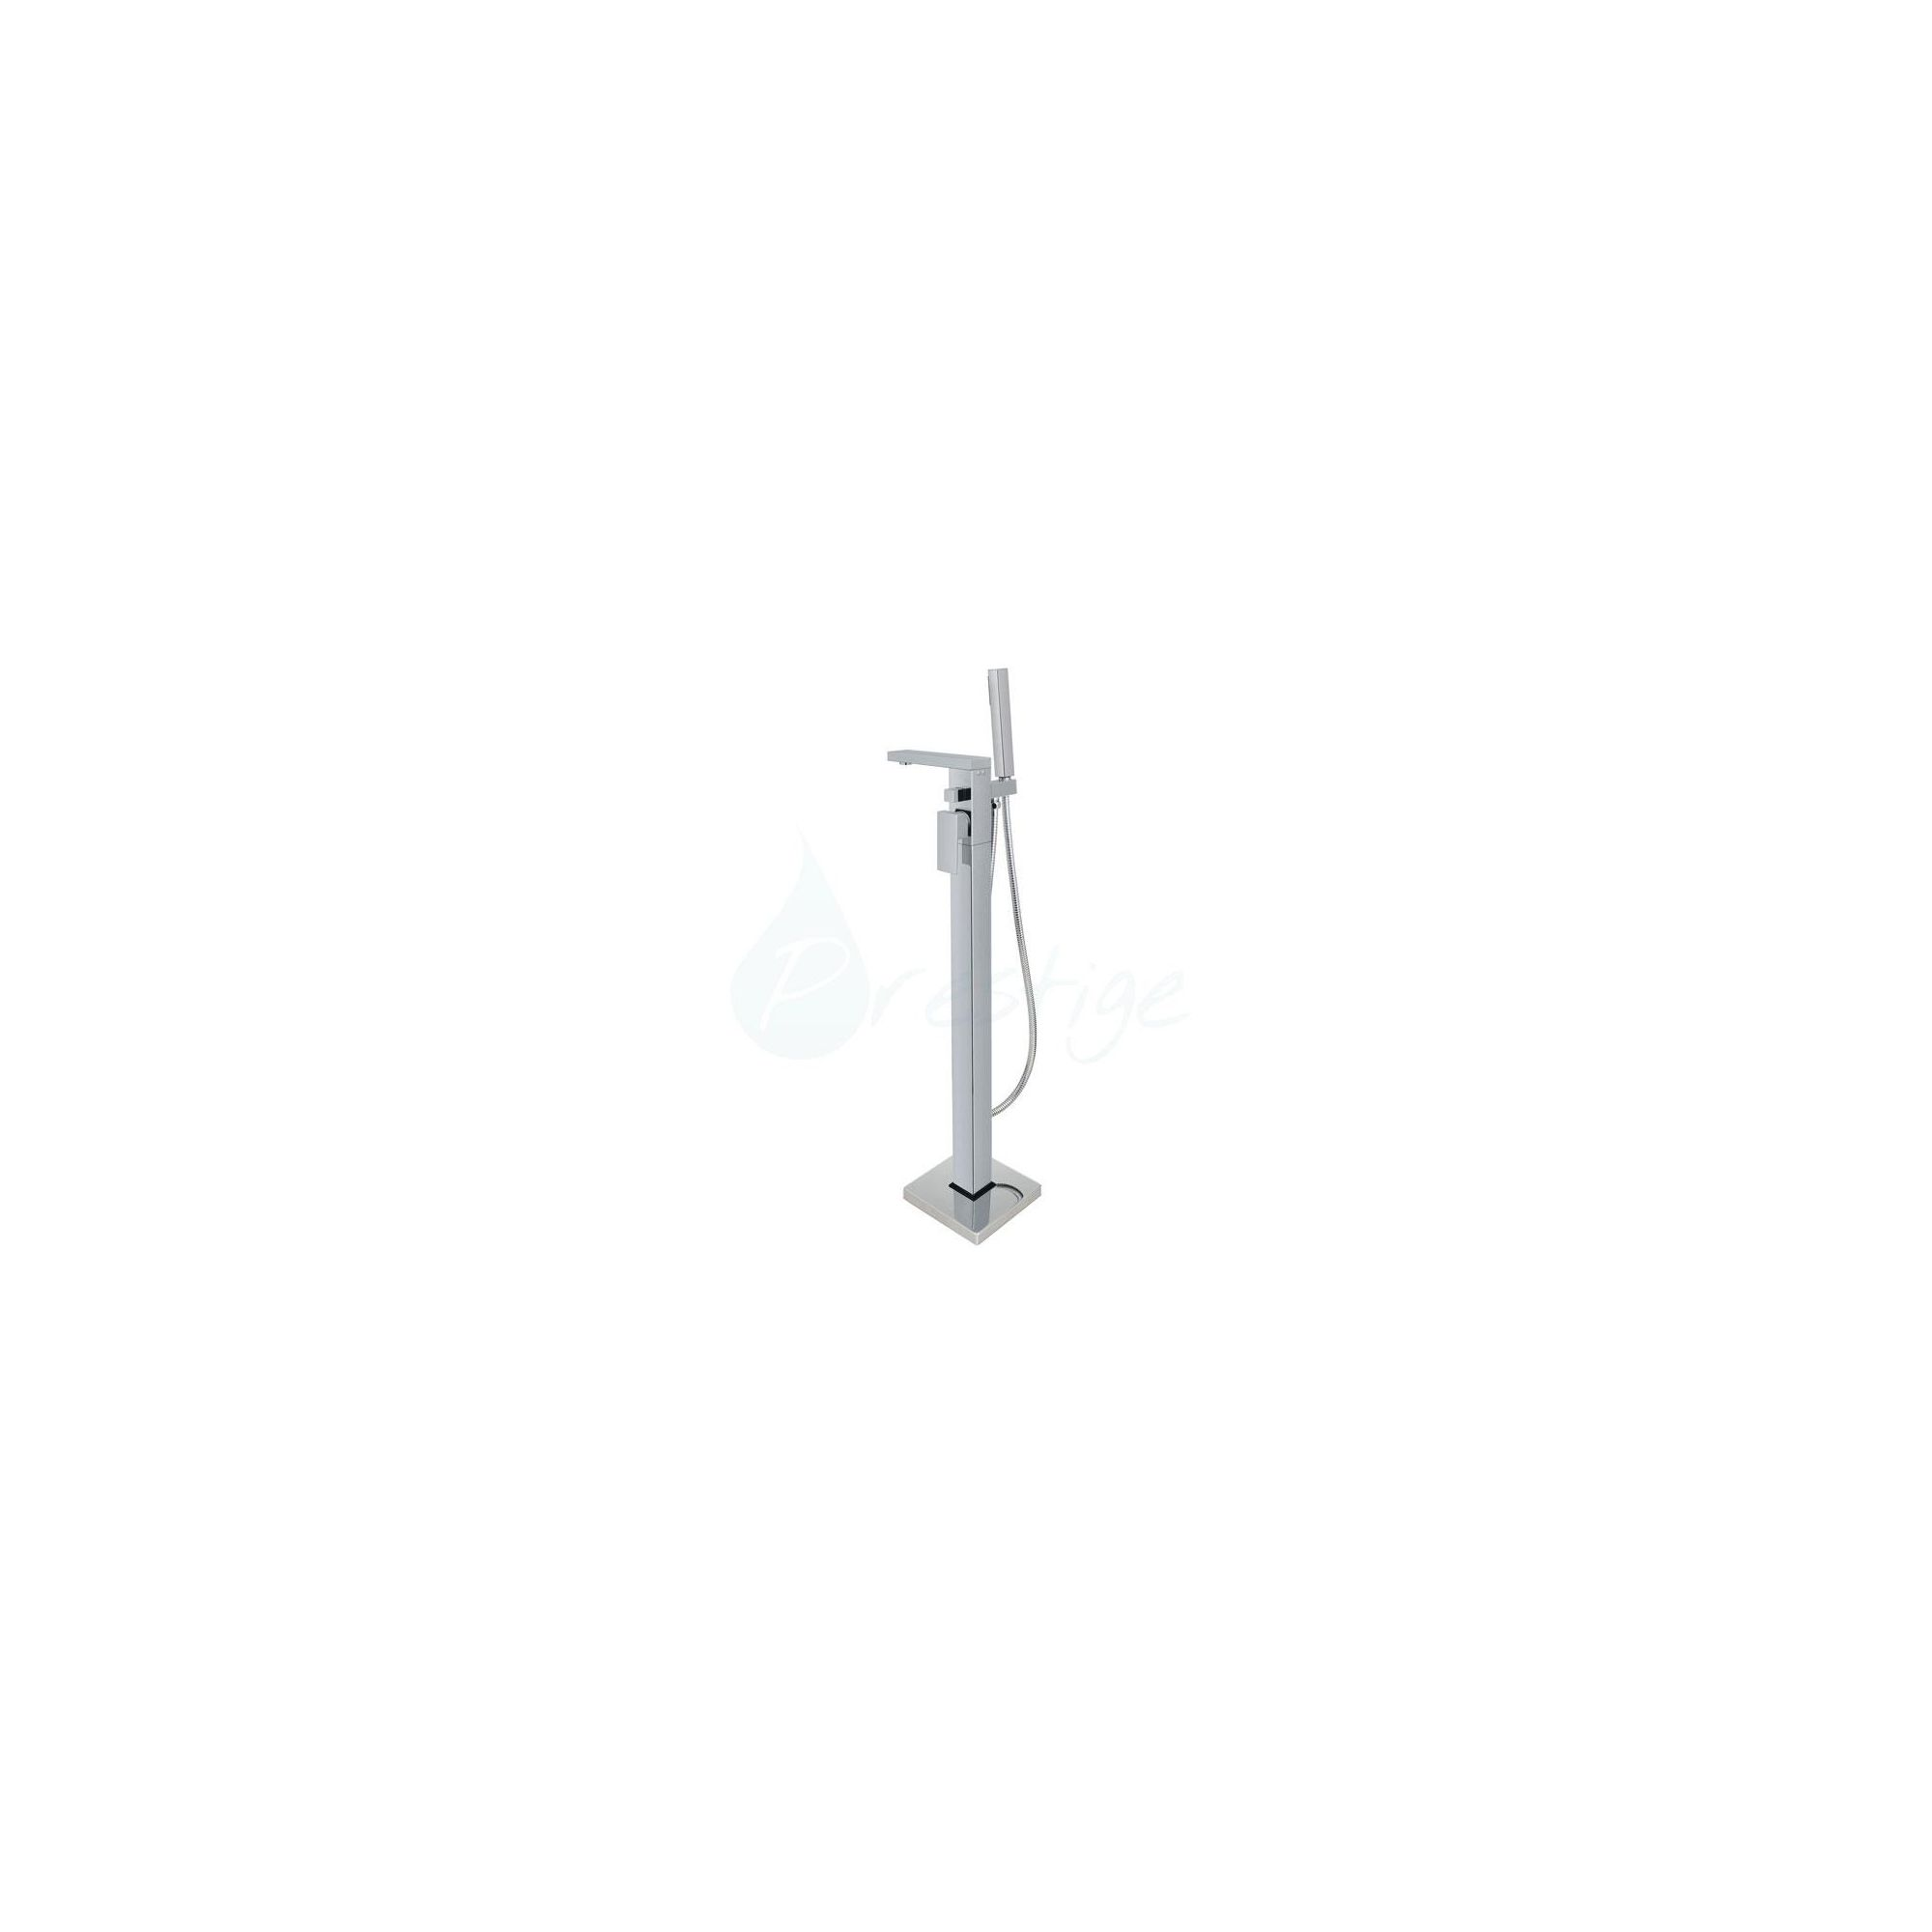 Prestige Massa Freestanding Bath Shower Mixer Tap, Single Handle, Chrome at Tesco Direct